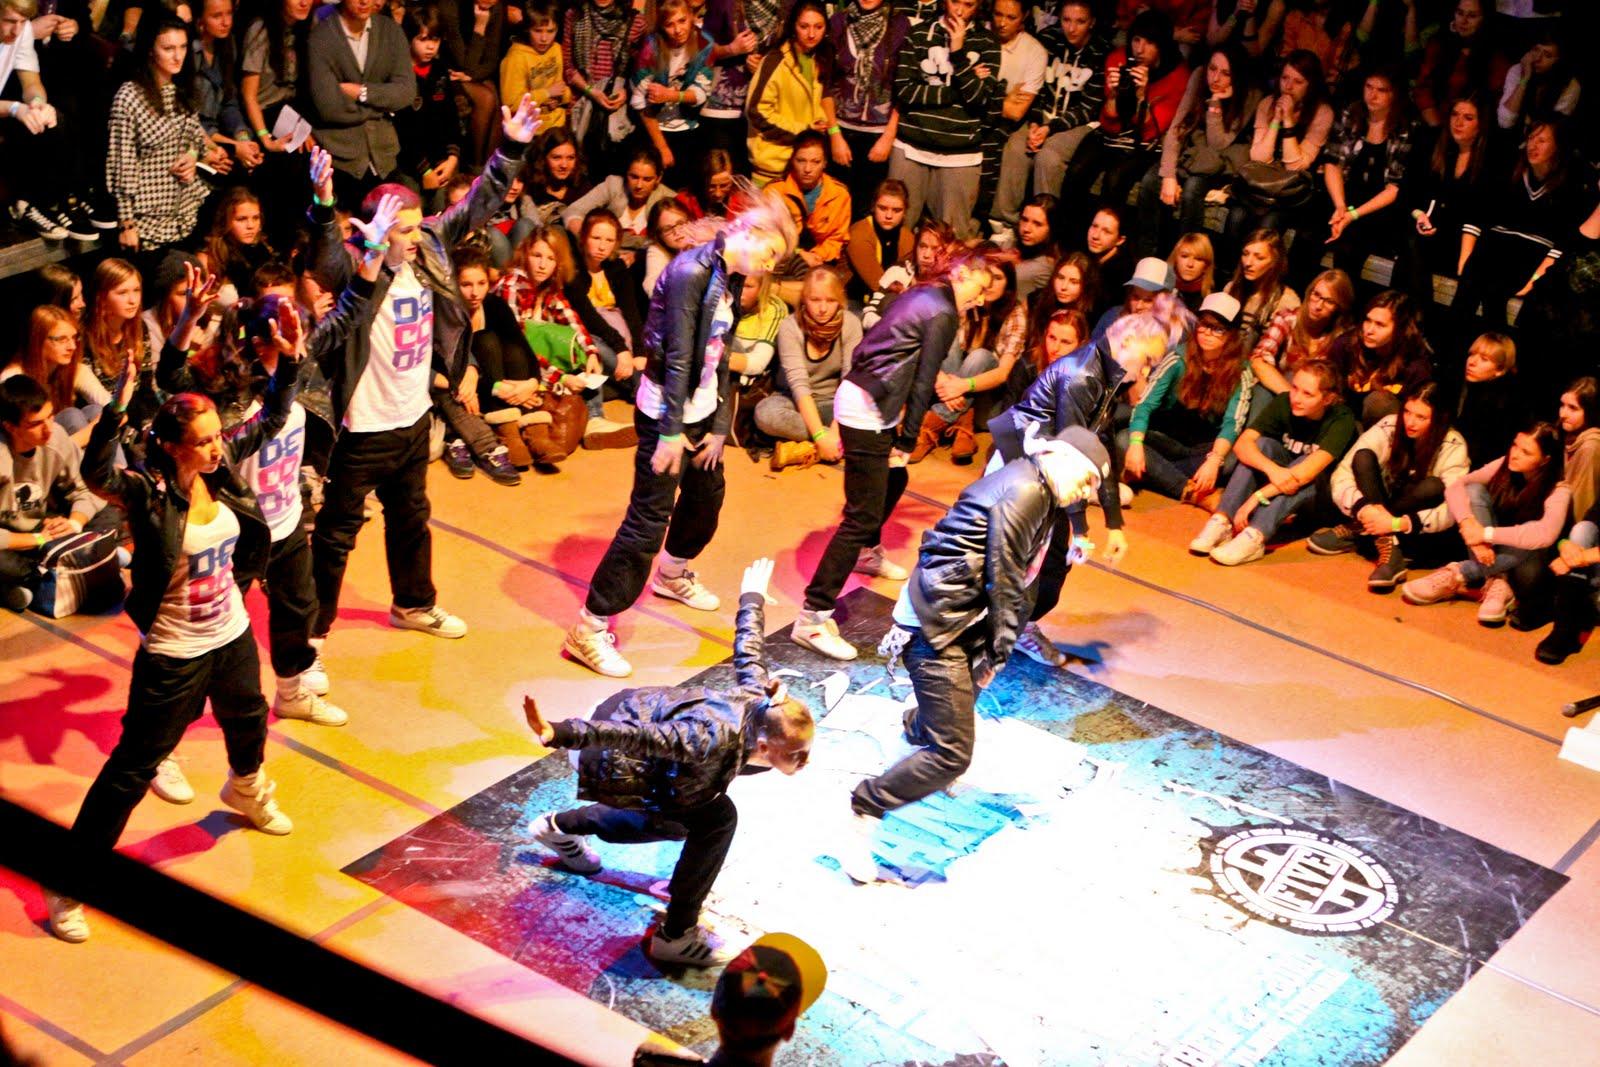 Urban Dance 2010 MJ show - IMG_4125.jpg